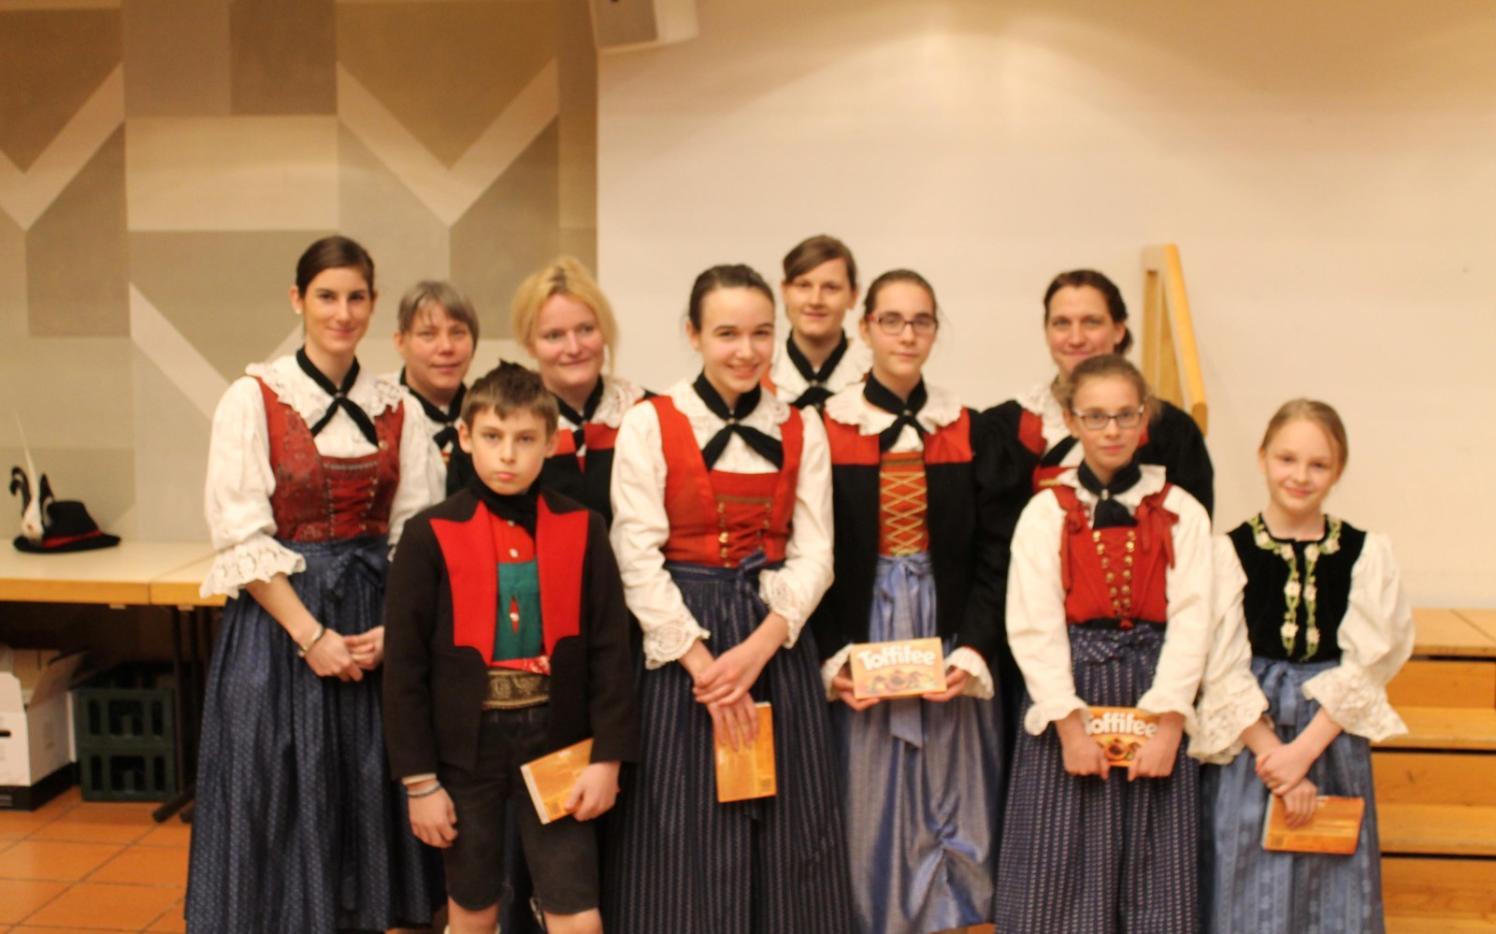 2017_Marling_Sebastiani Jahreshauptversammlung (5)